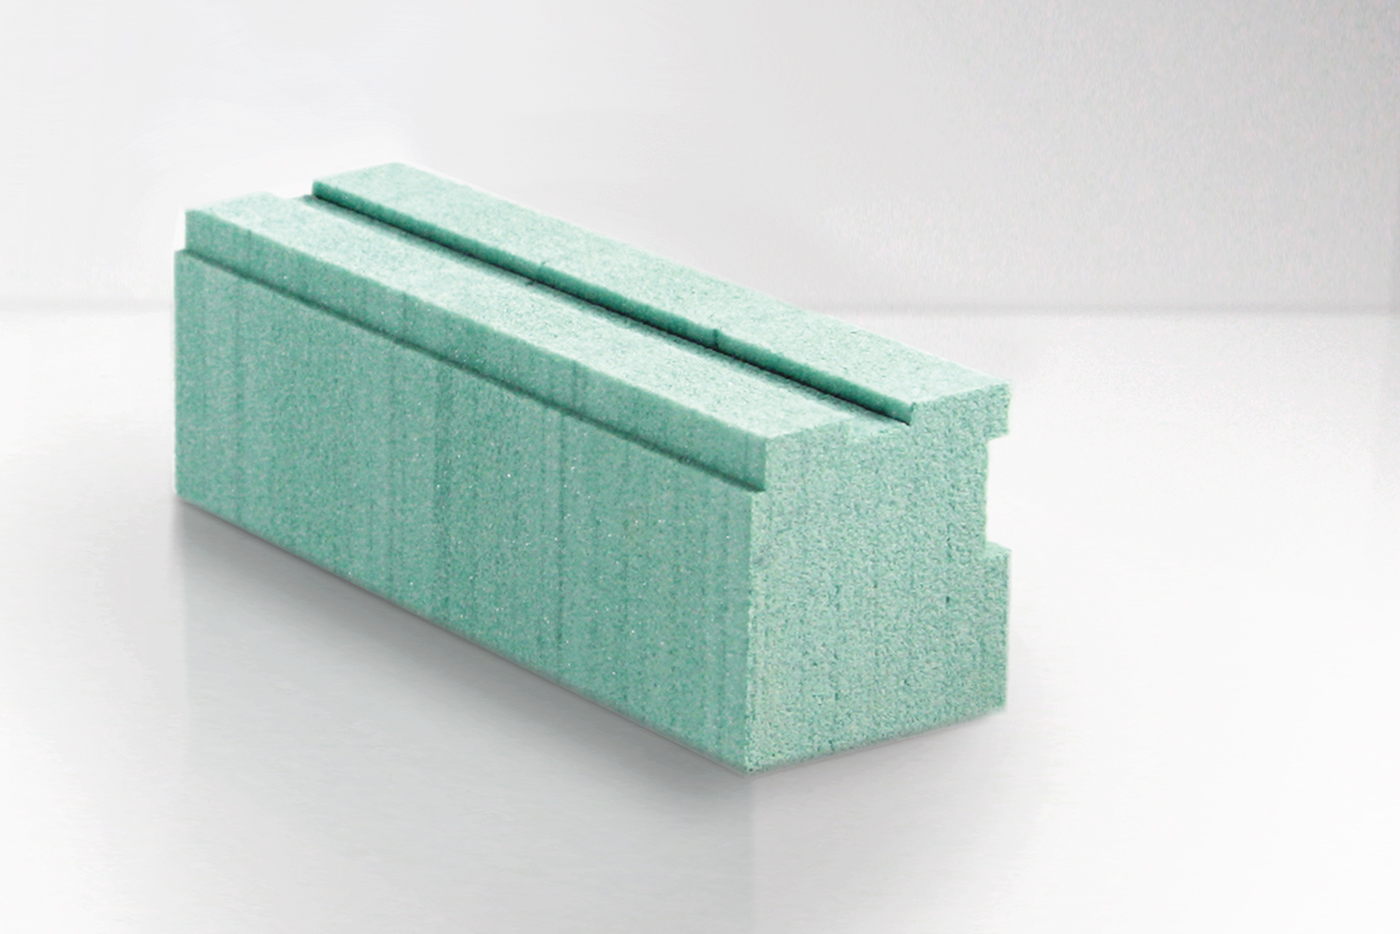 Fensterbankanschlussprofil aus Kerdyn Green FR, der PET Platte